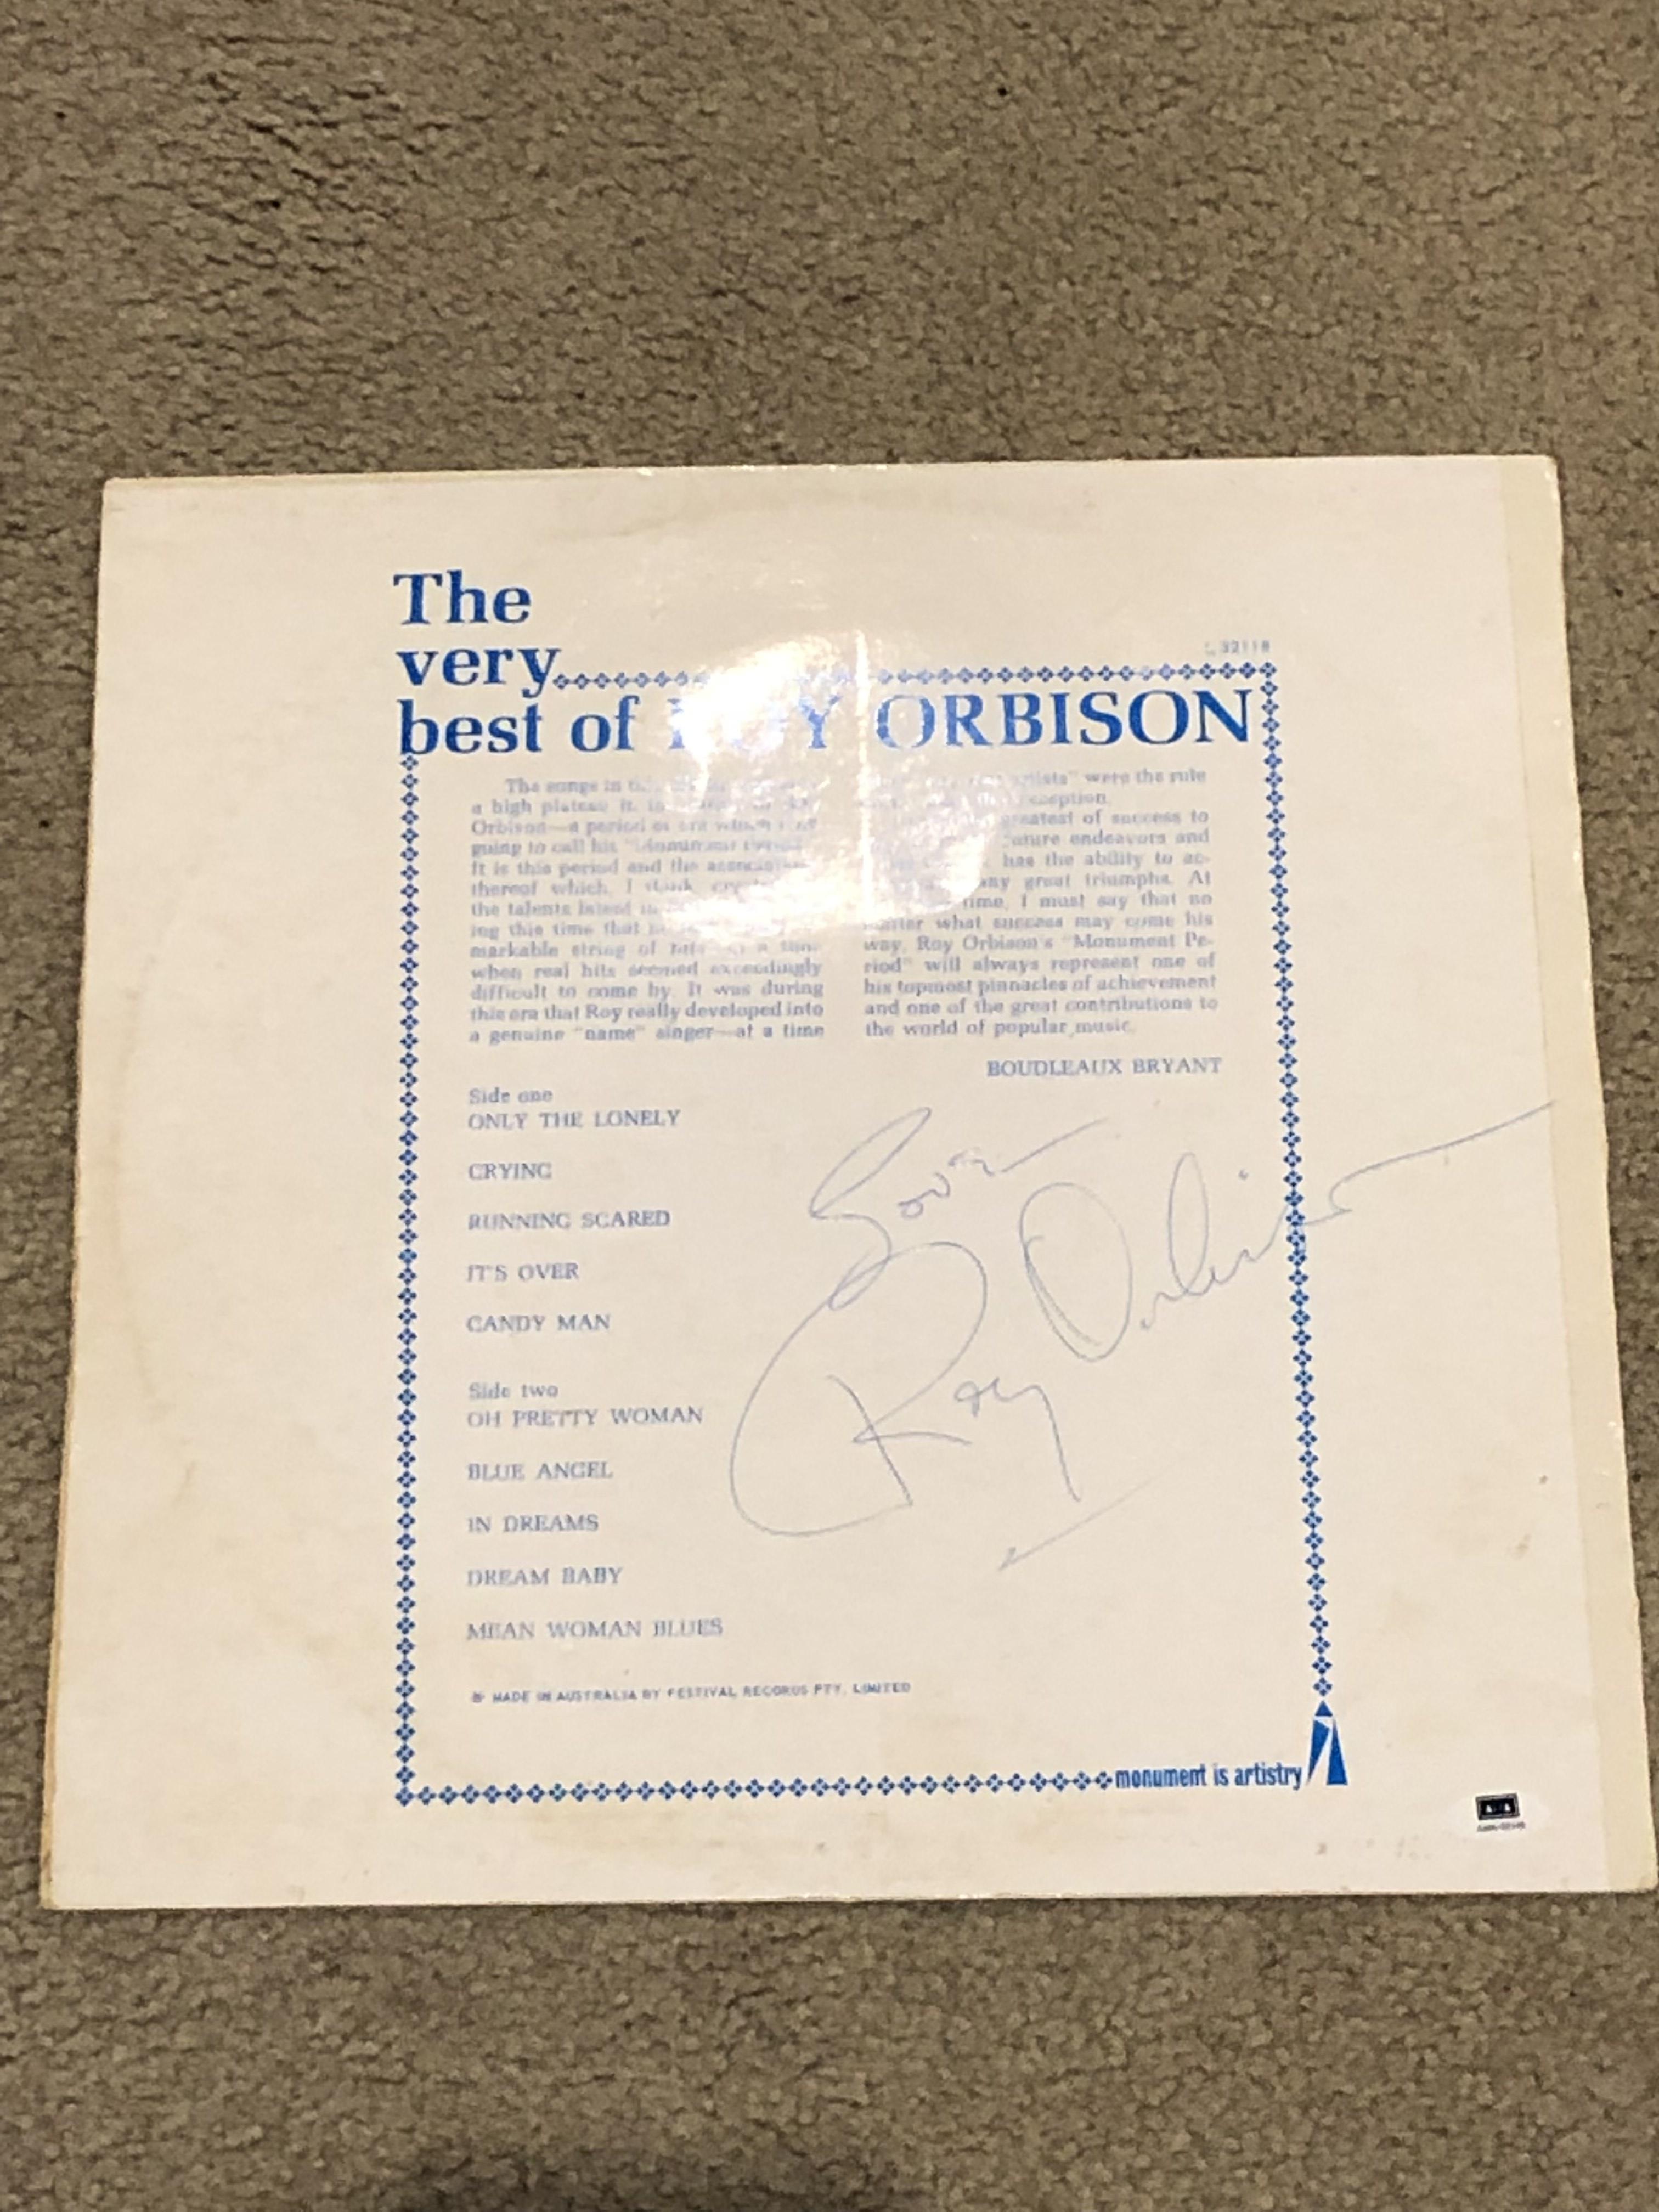 Roy Orbison signed album cover